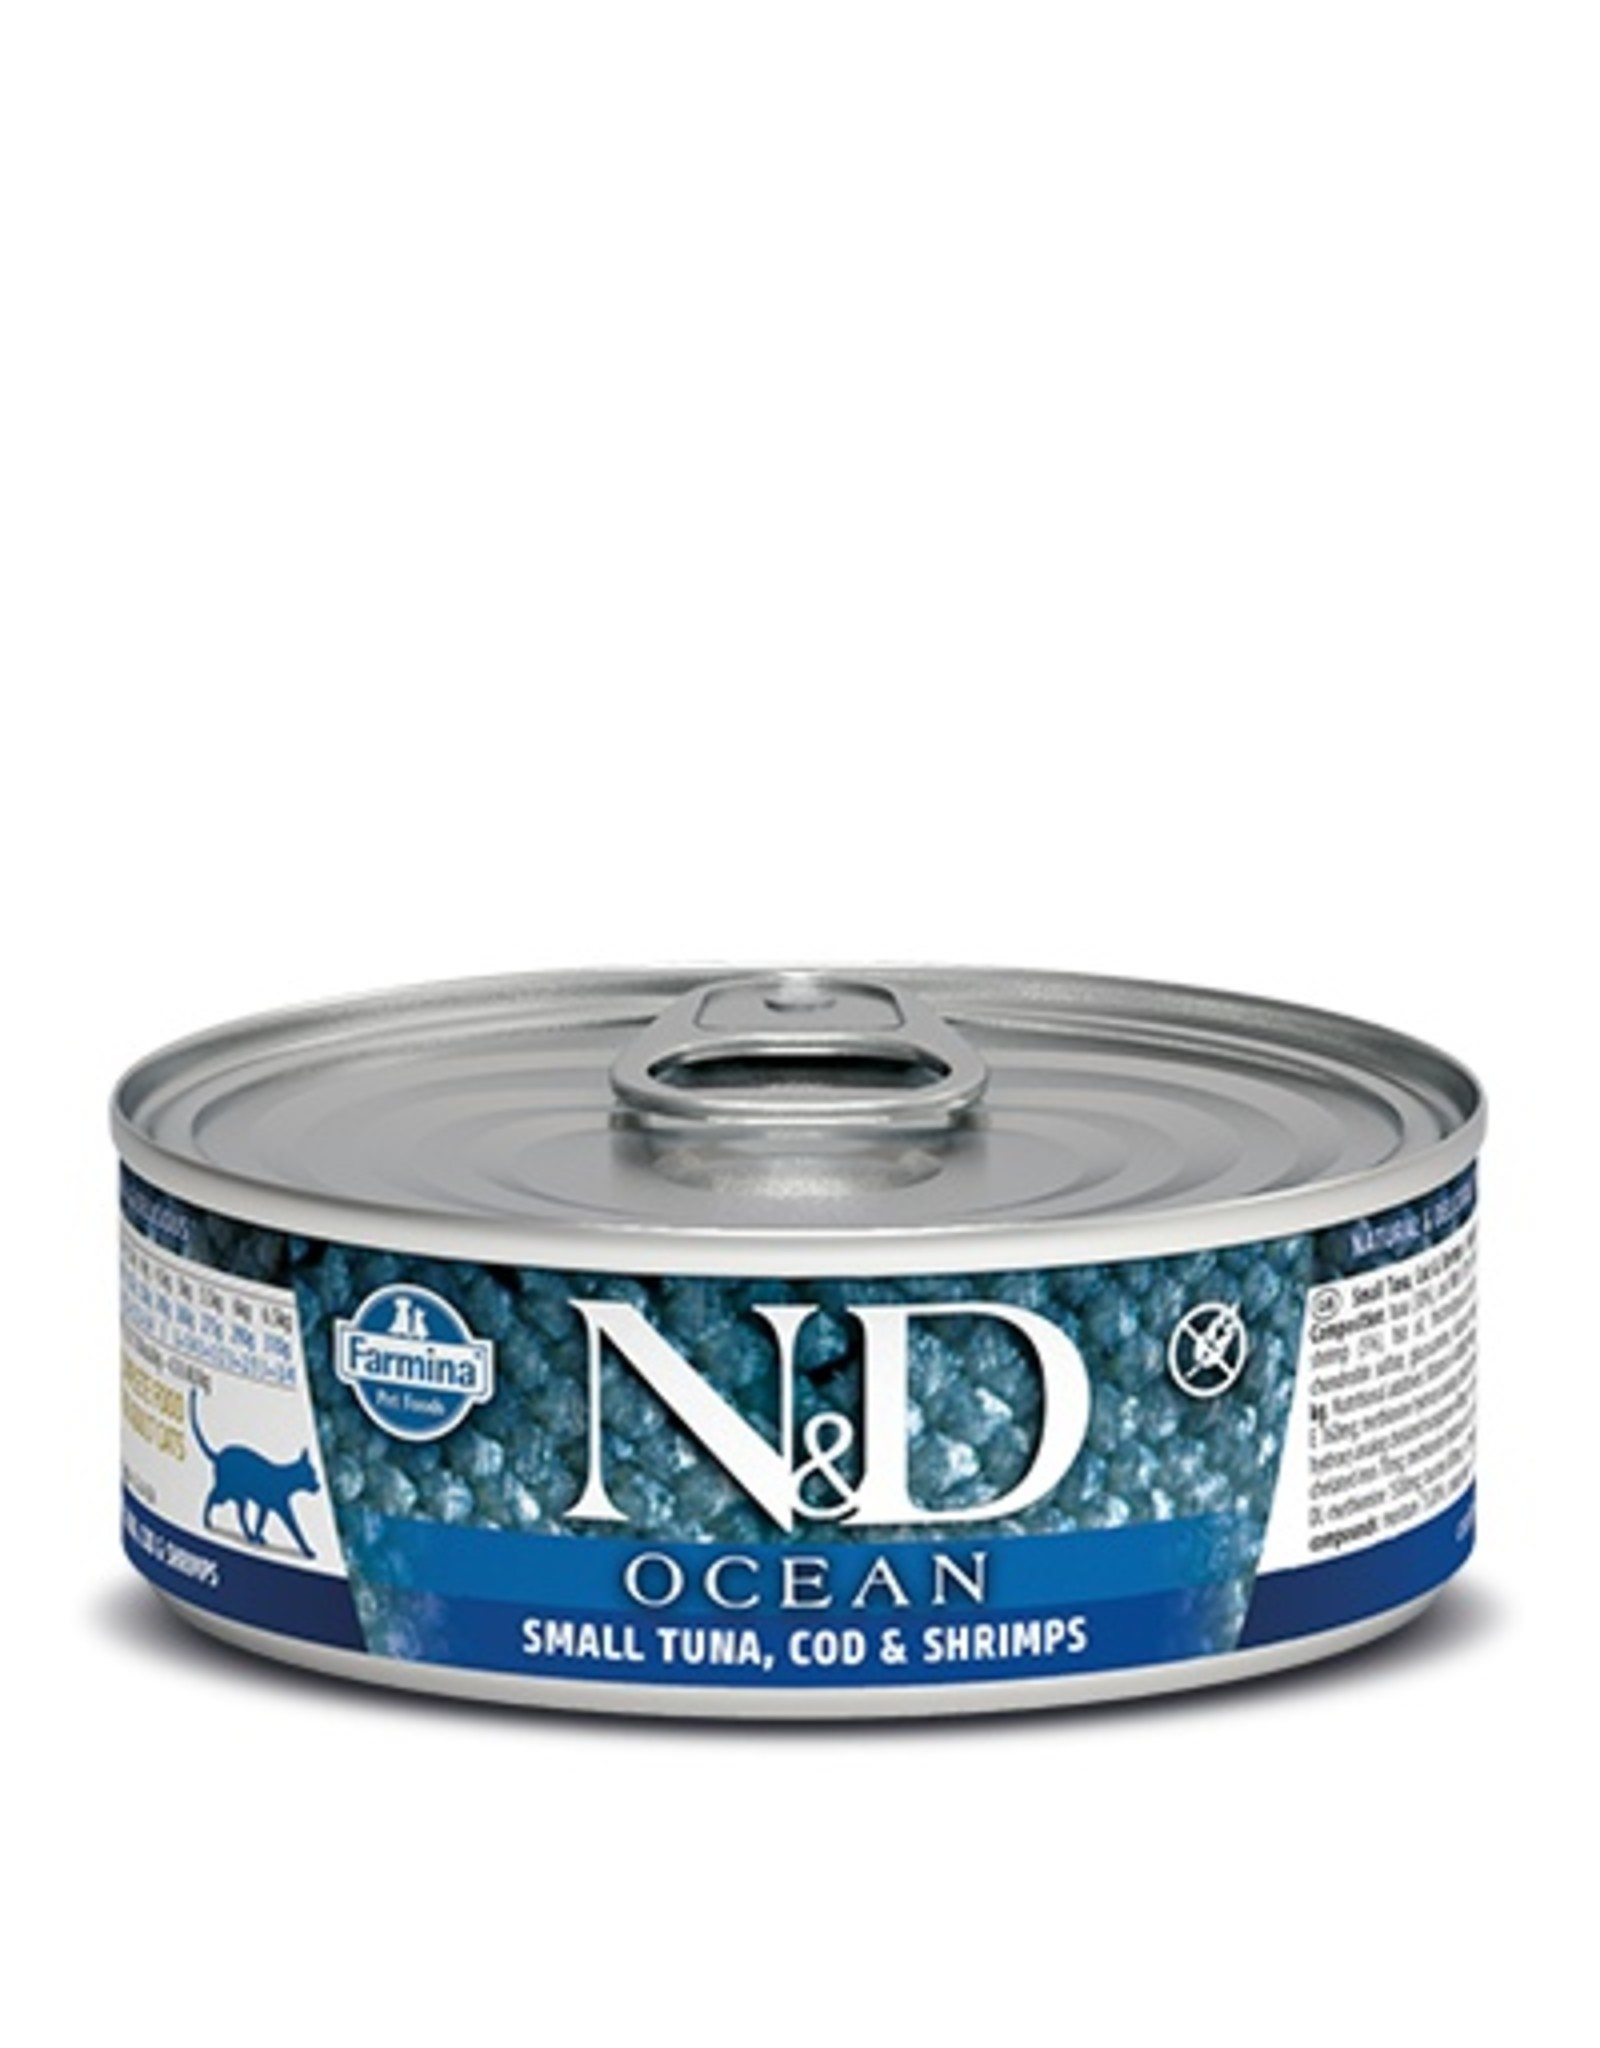 Farmina Farmina Cat N&D Ocean - Small Tuna, Cod & Shrimp 2.8oz